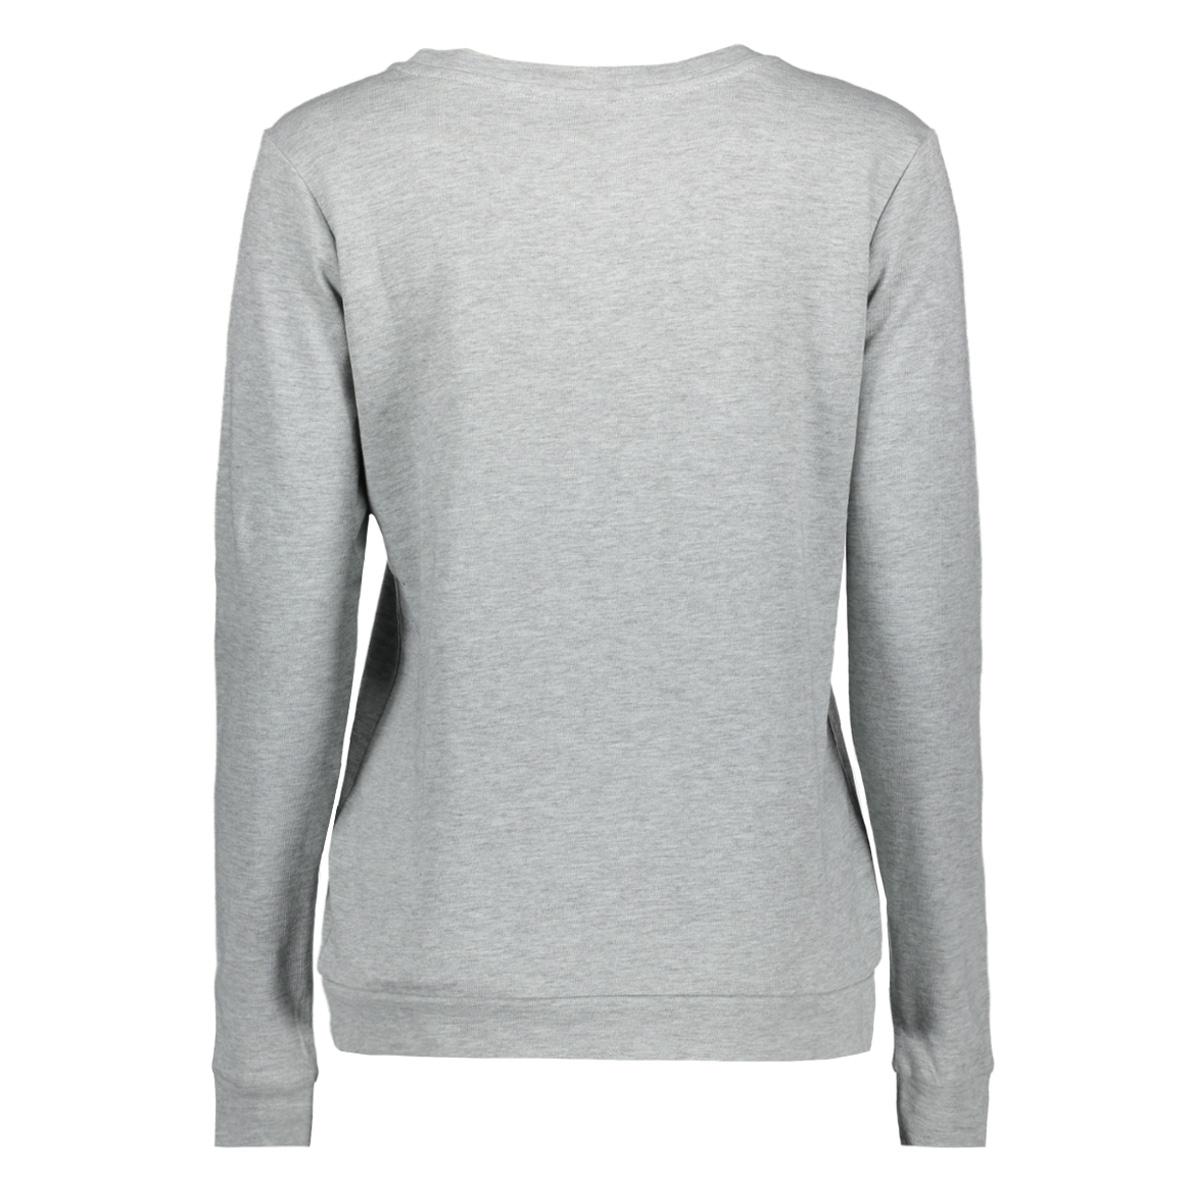 jdymilly l/s print sweat swt rpt 15133660 jacqueline de yong sweater blue haze/light